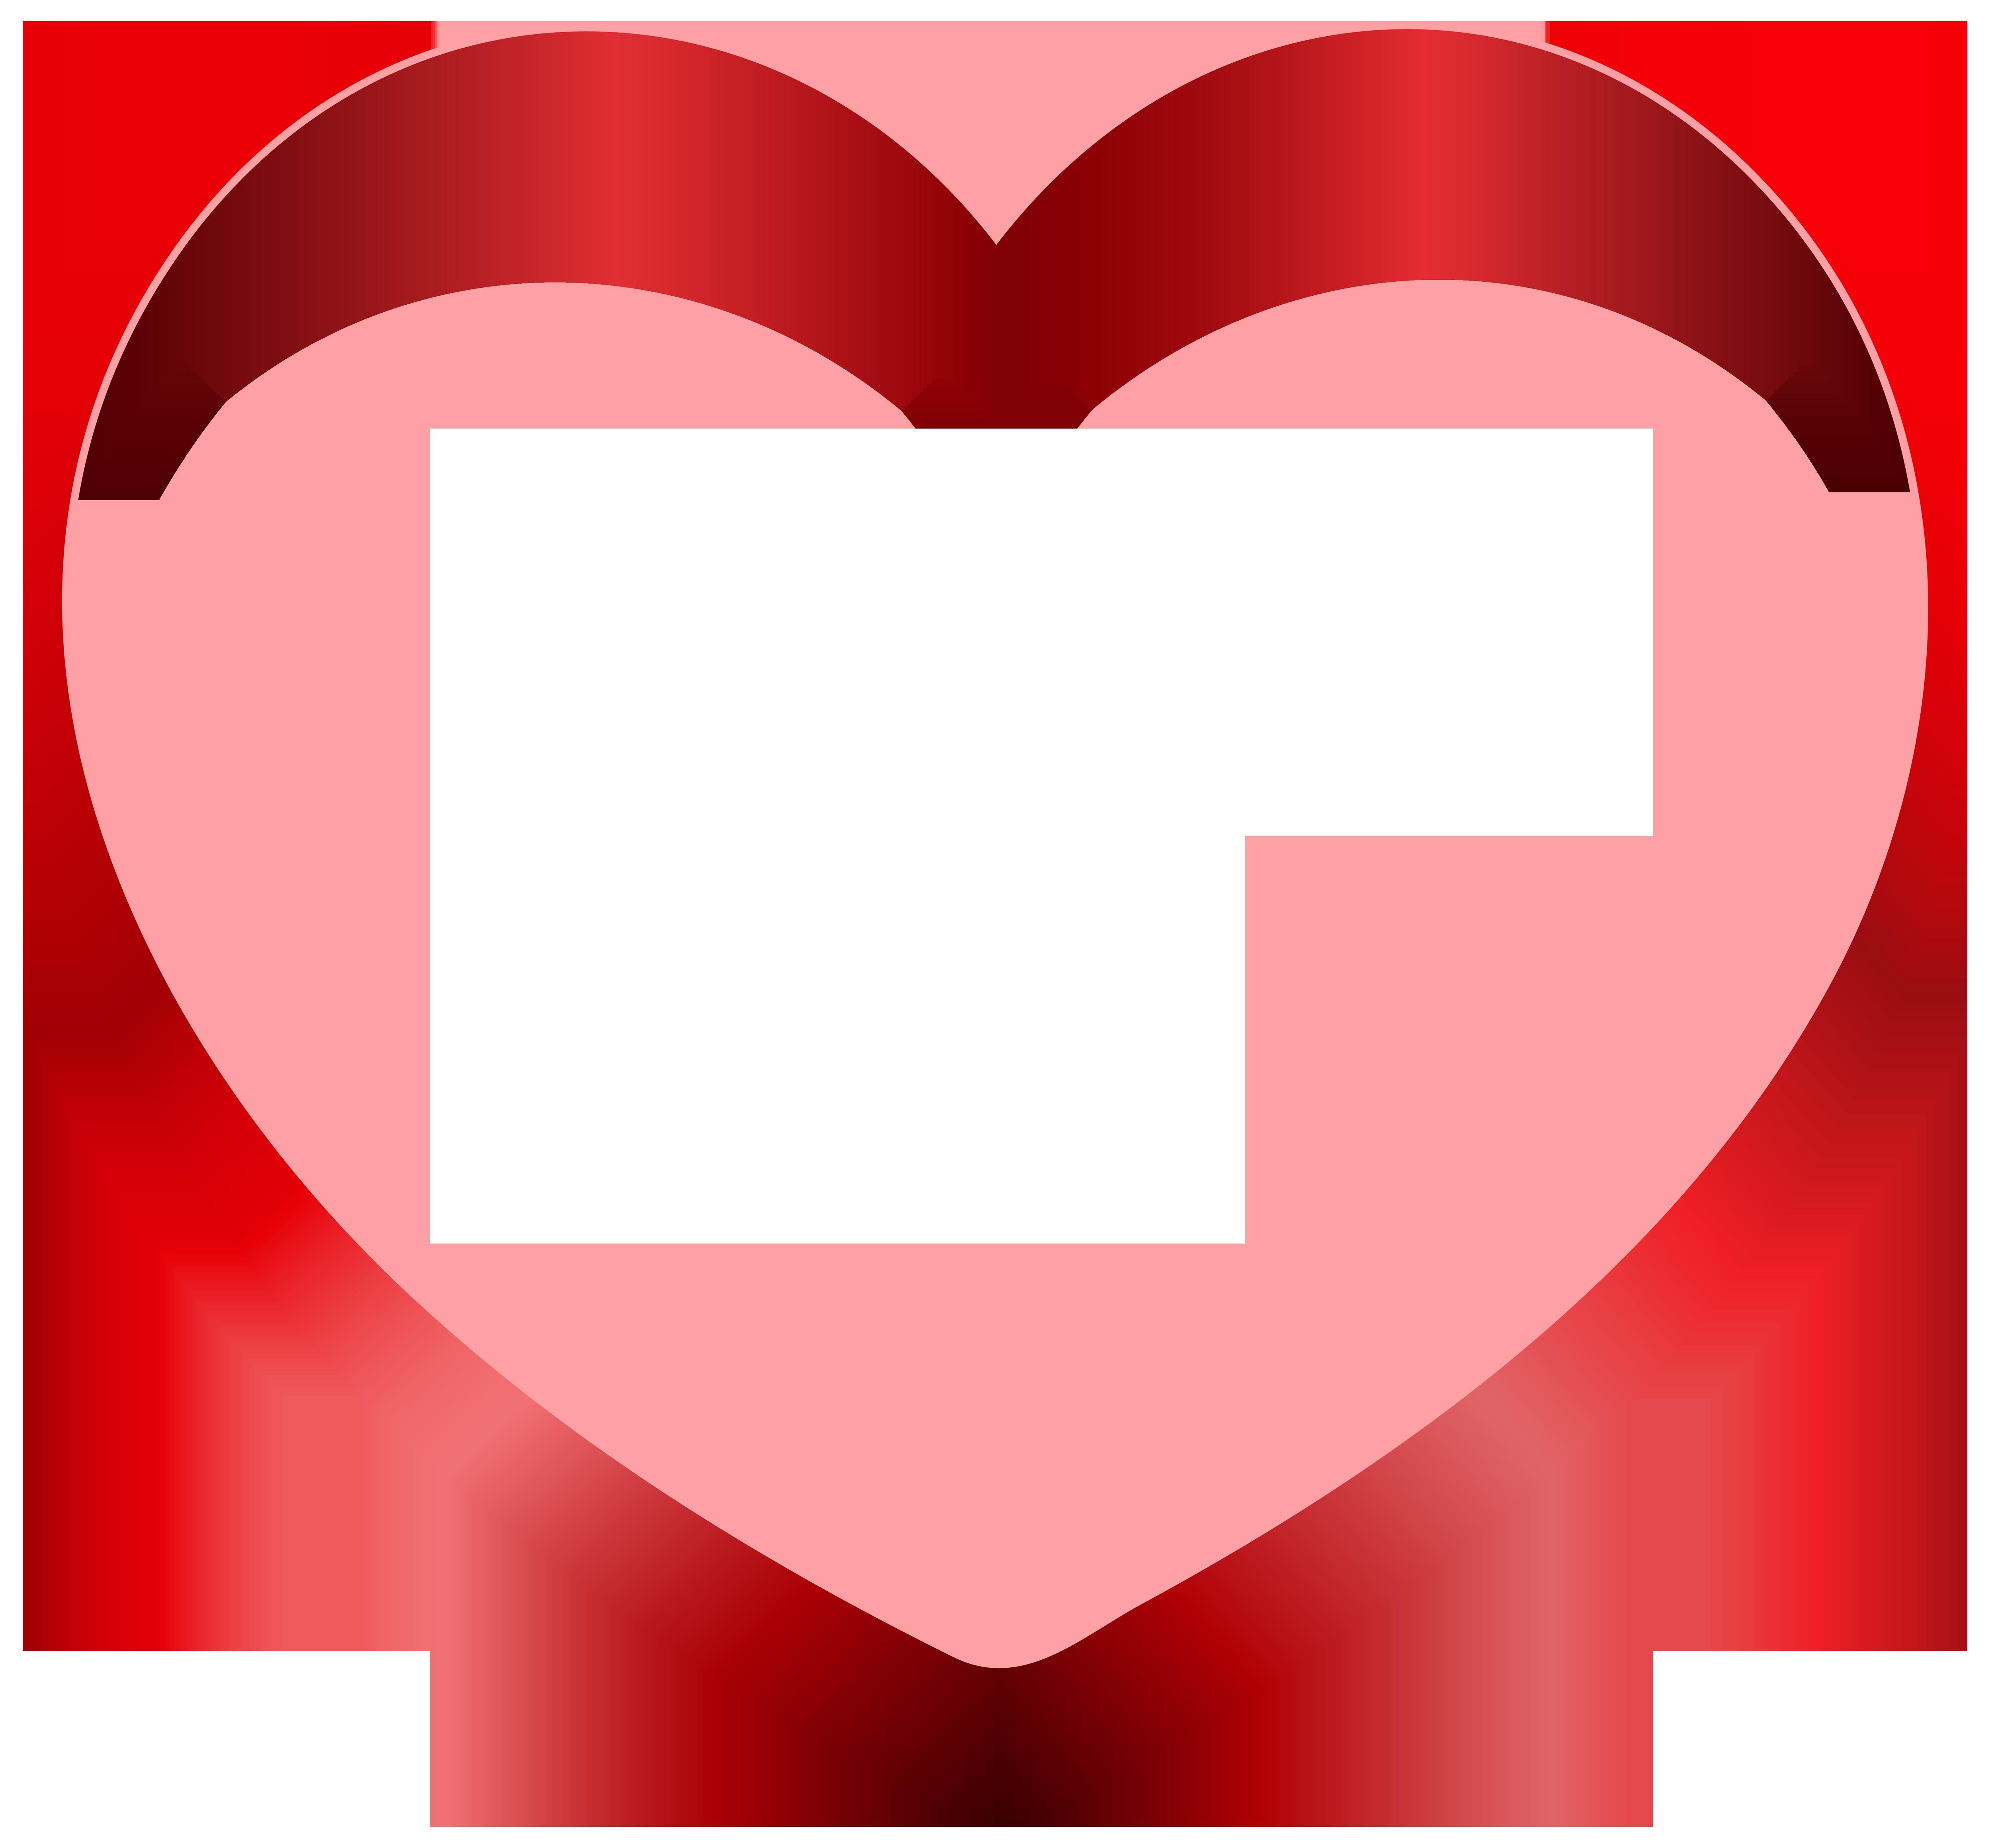 Transparent heart png jokingart. Hearts clipart sun